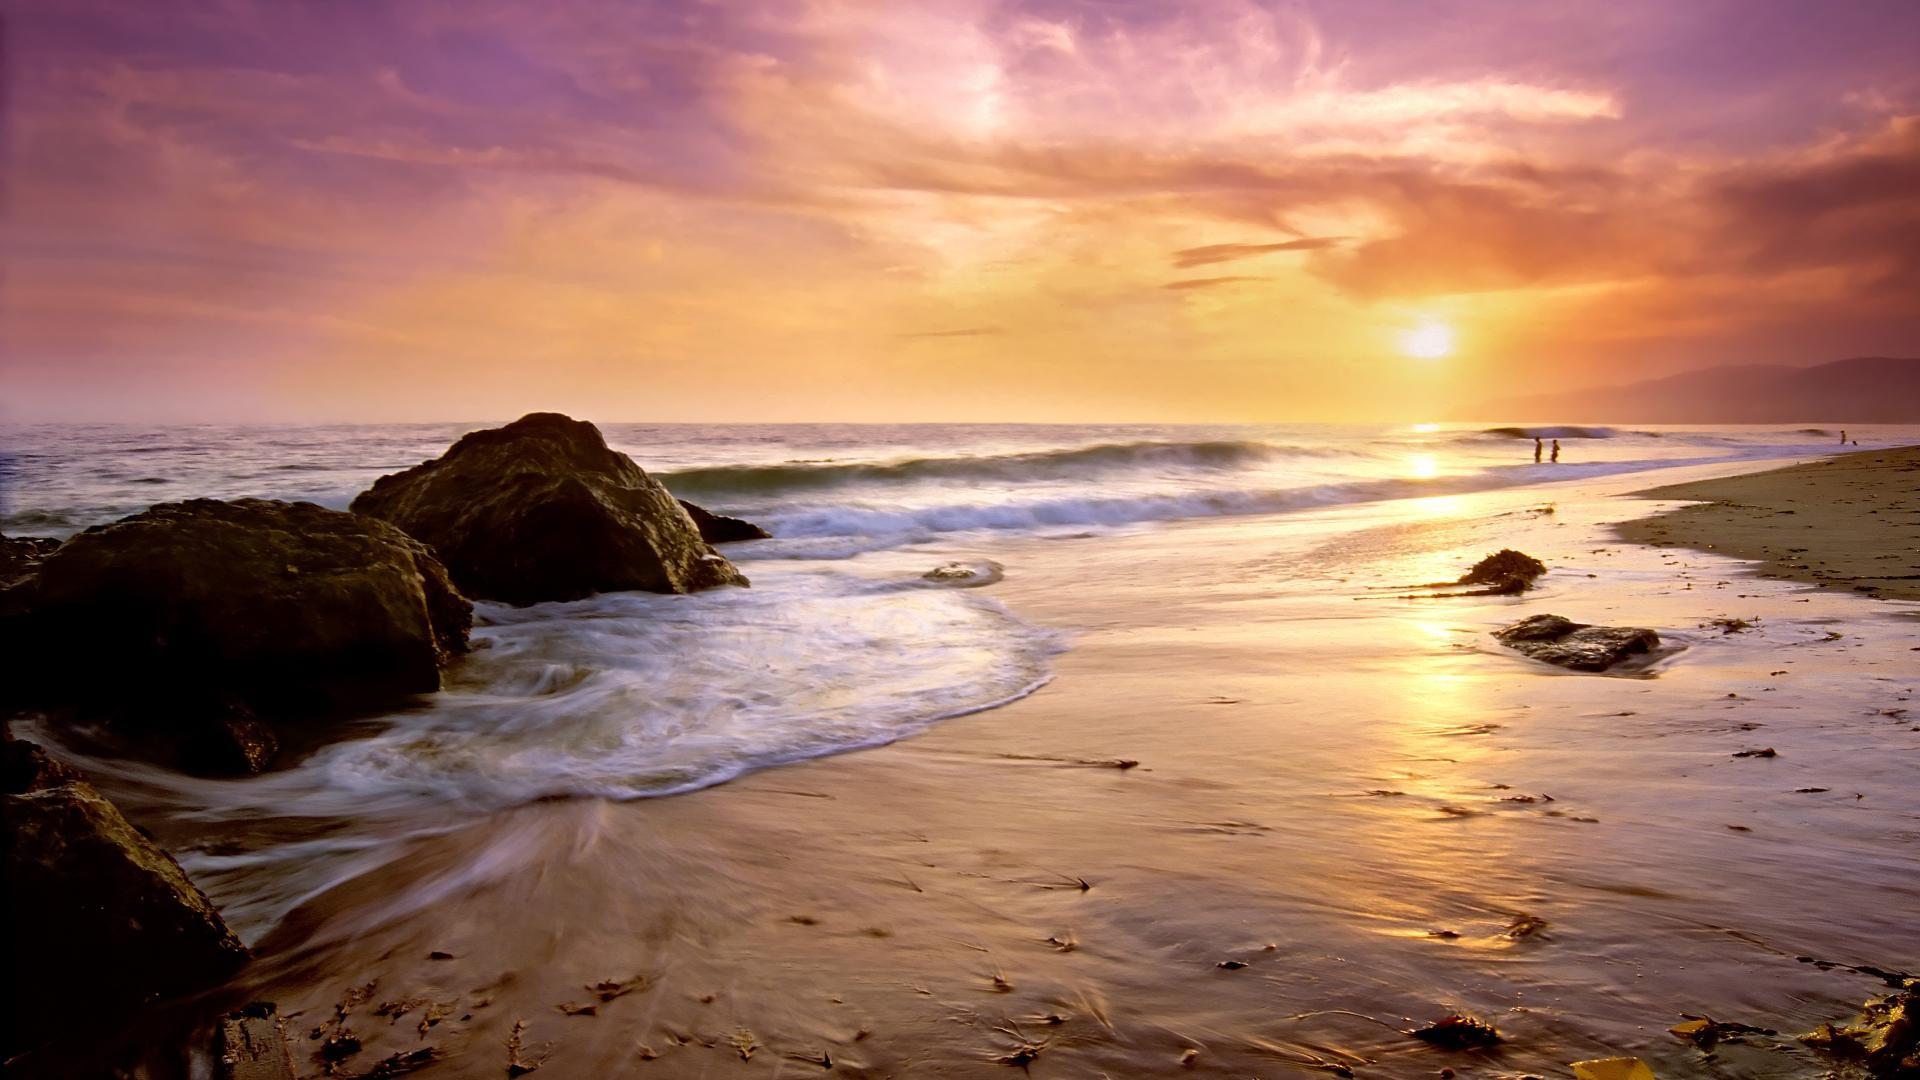 Tumblr Beach Sunset Backgrounds 7097 1920 x 1080 .